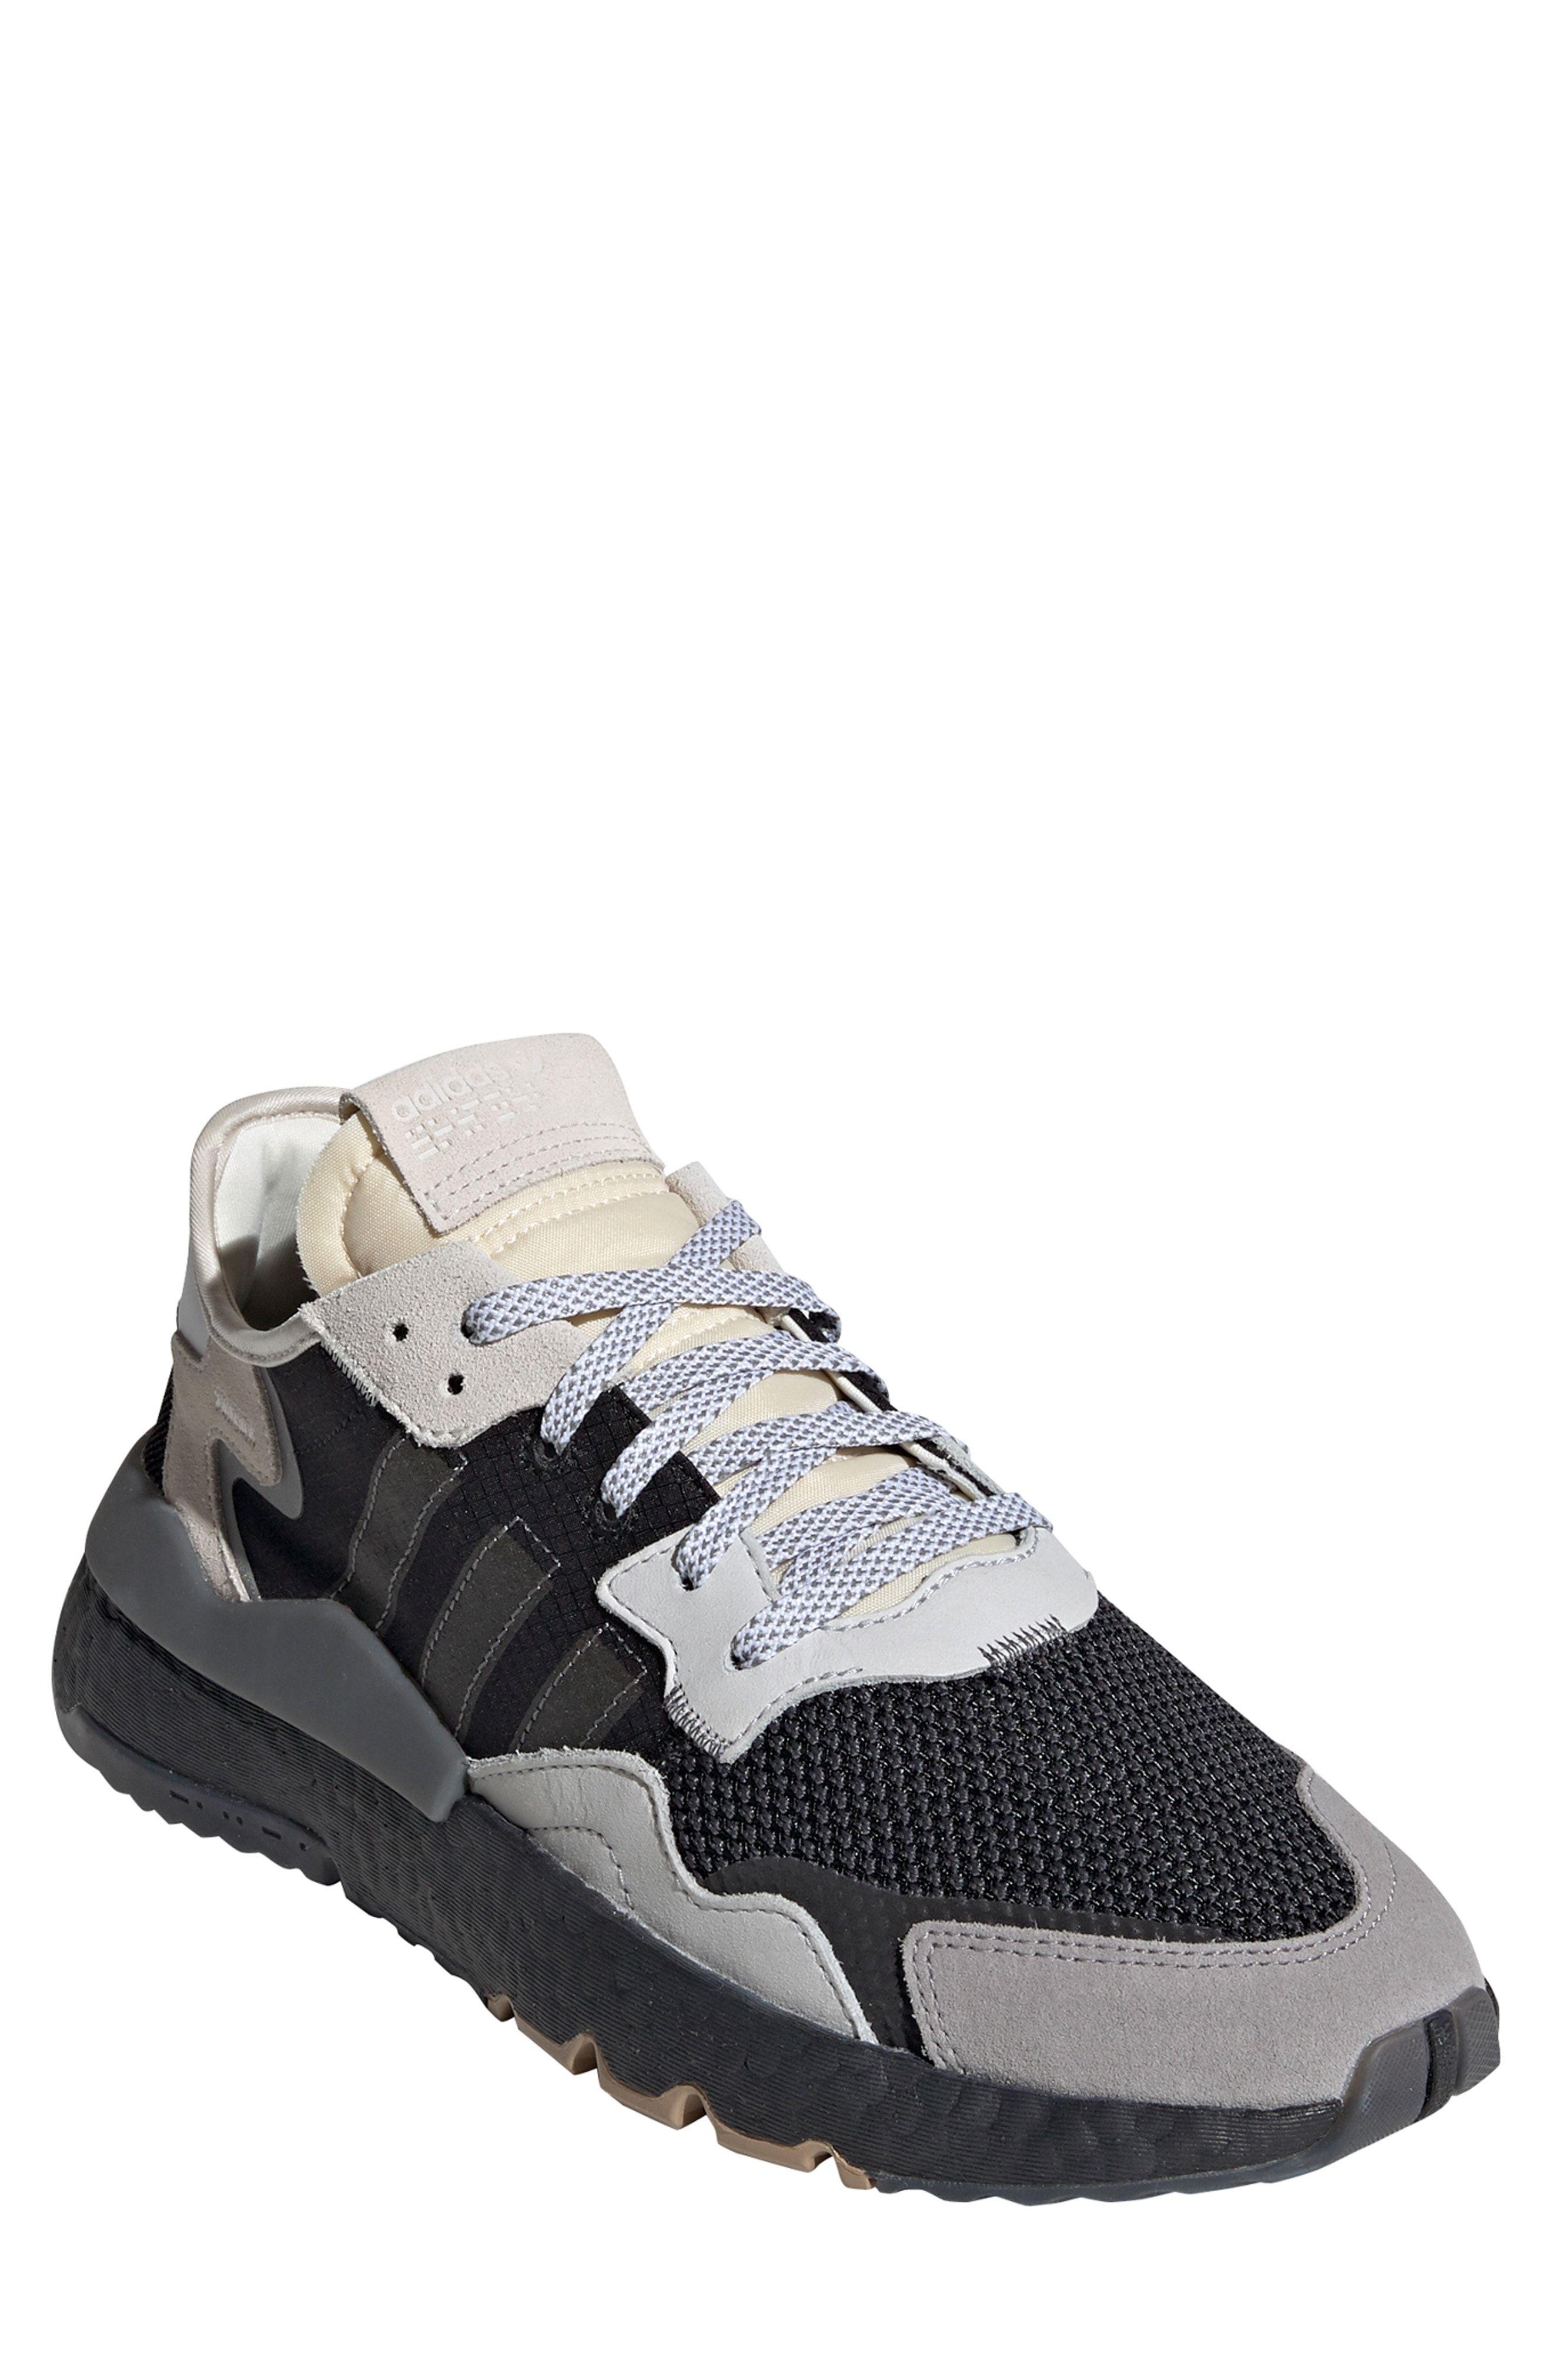 9e3637d32f69 ADIDAS ORIGINALS NITE JOGGER SNEAKER.  adidasoriginals  shoes ...